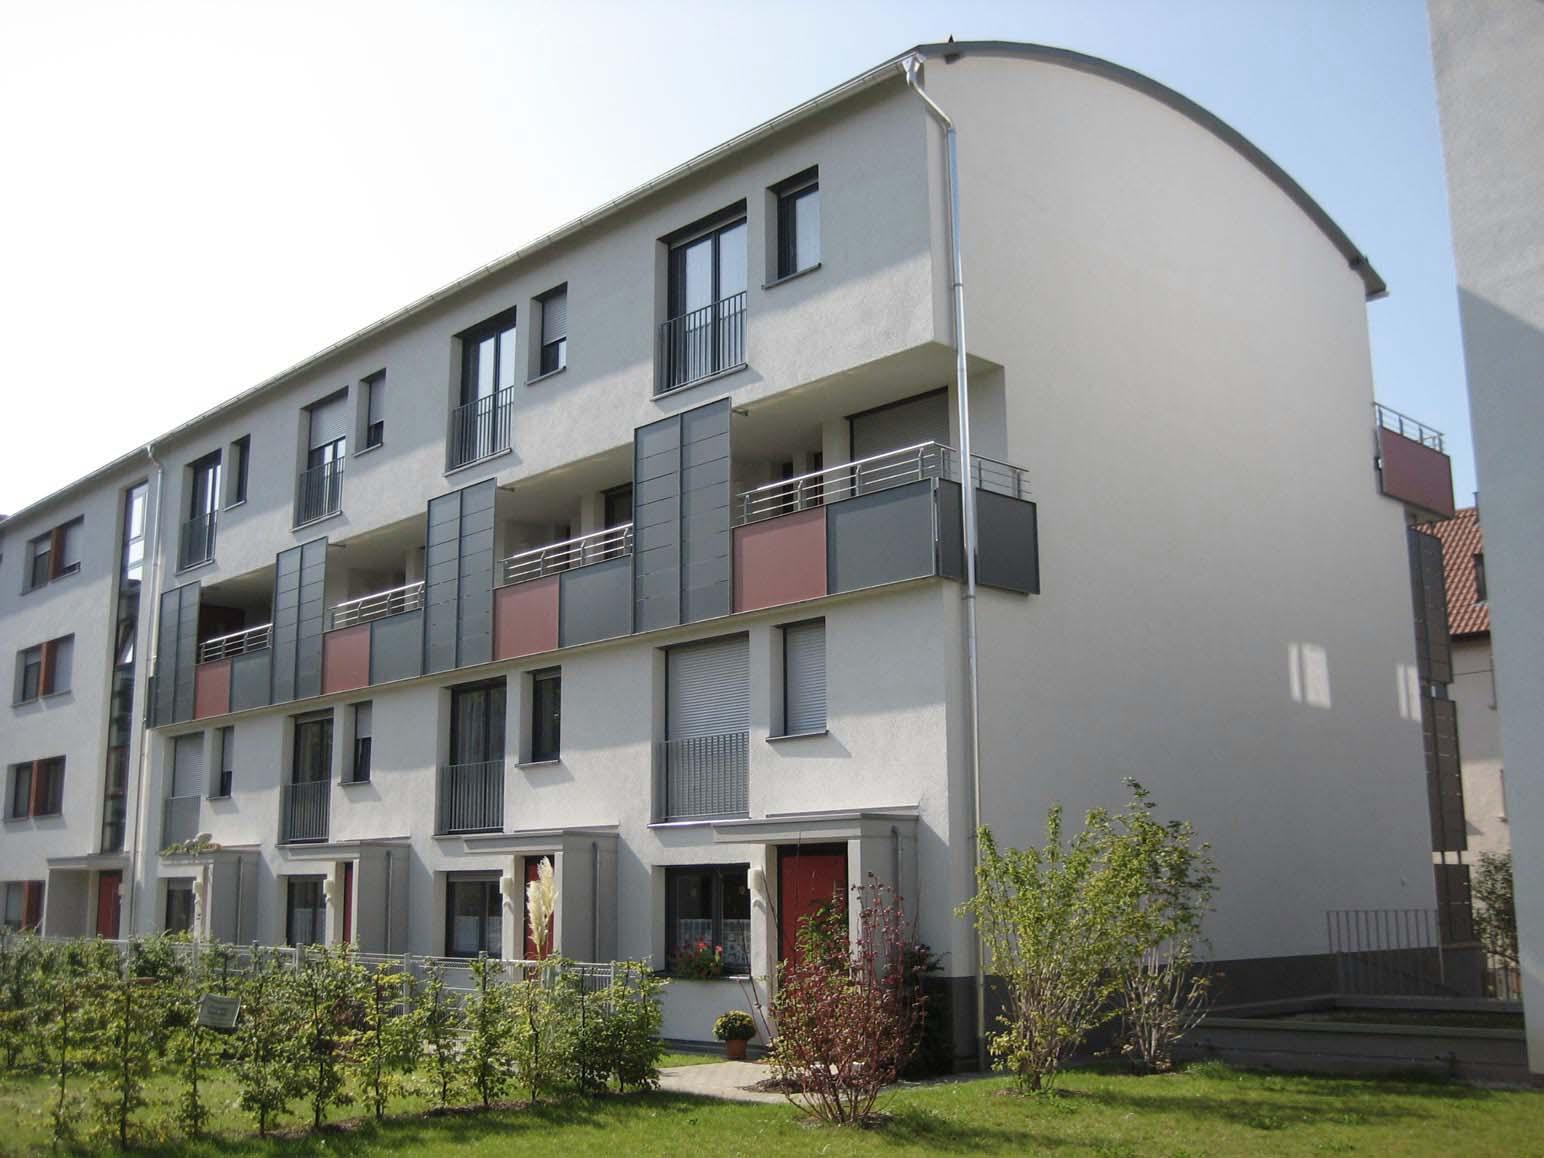 Mehrfamilienhaus mit gemischten Wohntypen